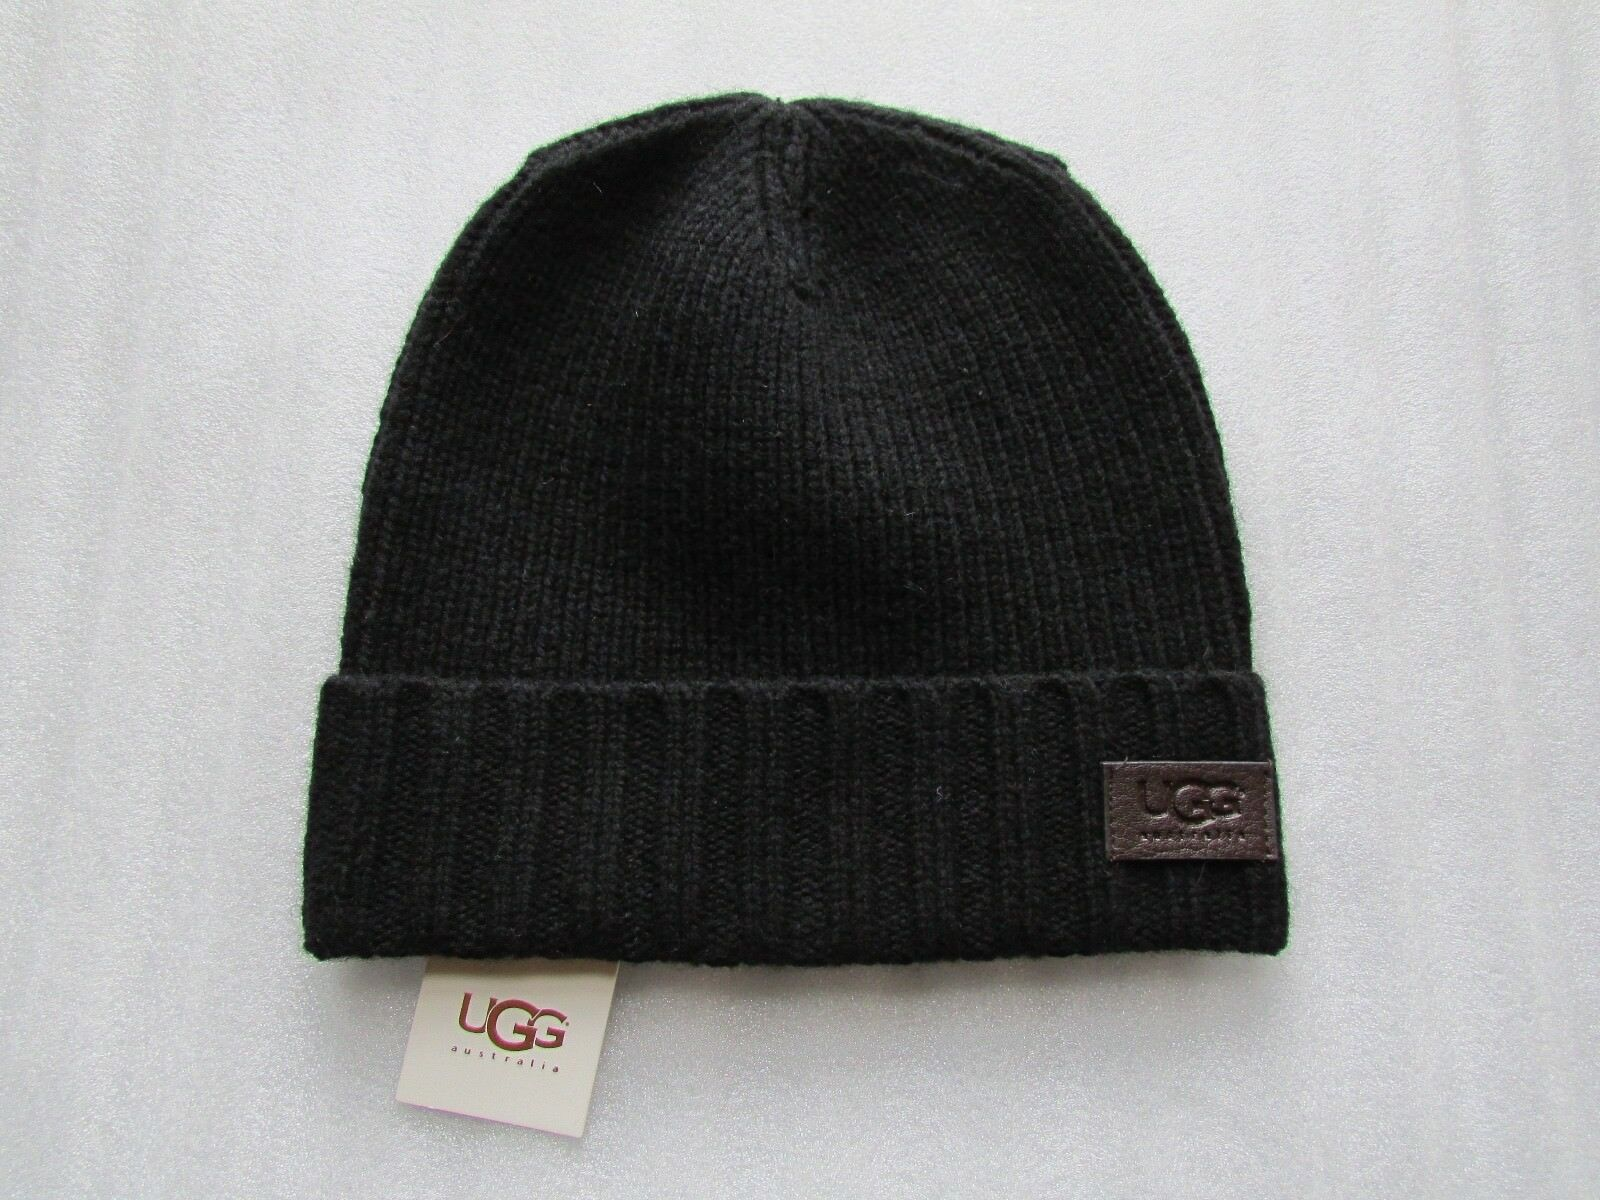 UGG Hat Ugg Cuff Knit Beanie Leather Ugg Hat Logo Black Wool O/S NEW f500d3